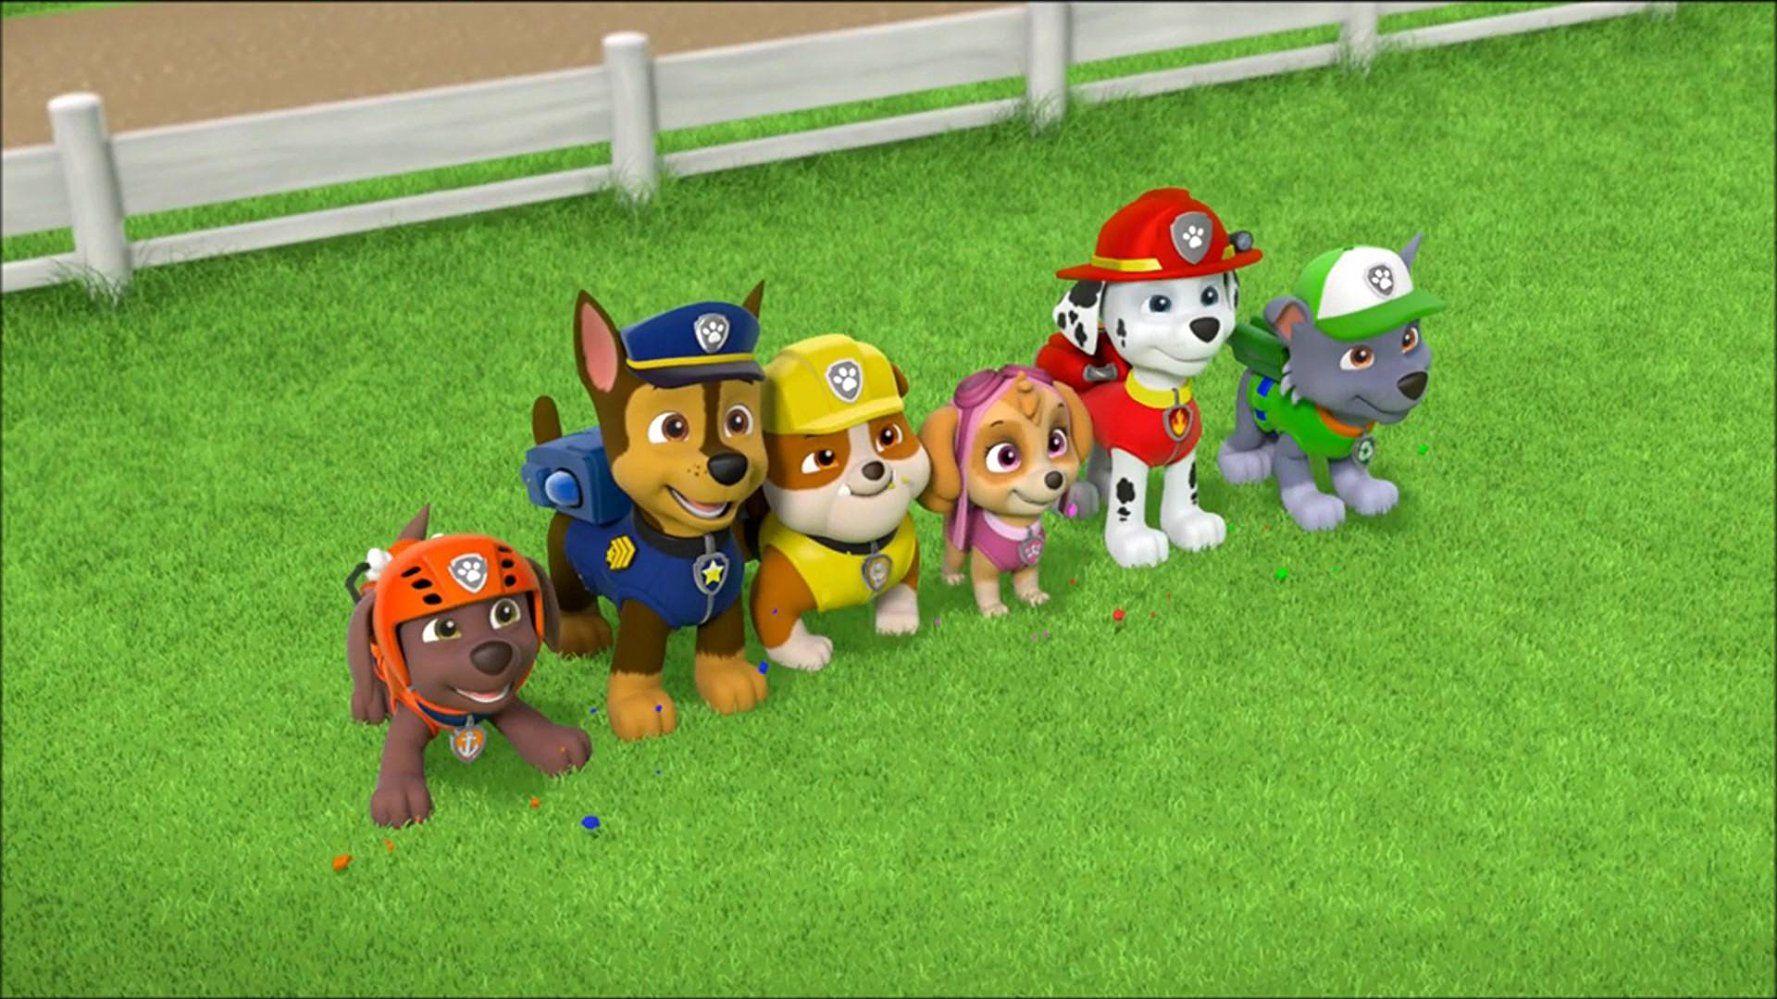 PAW Patrol Arrives on Nickelodeon's NOGGIN Service | Collider